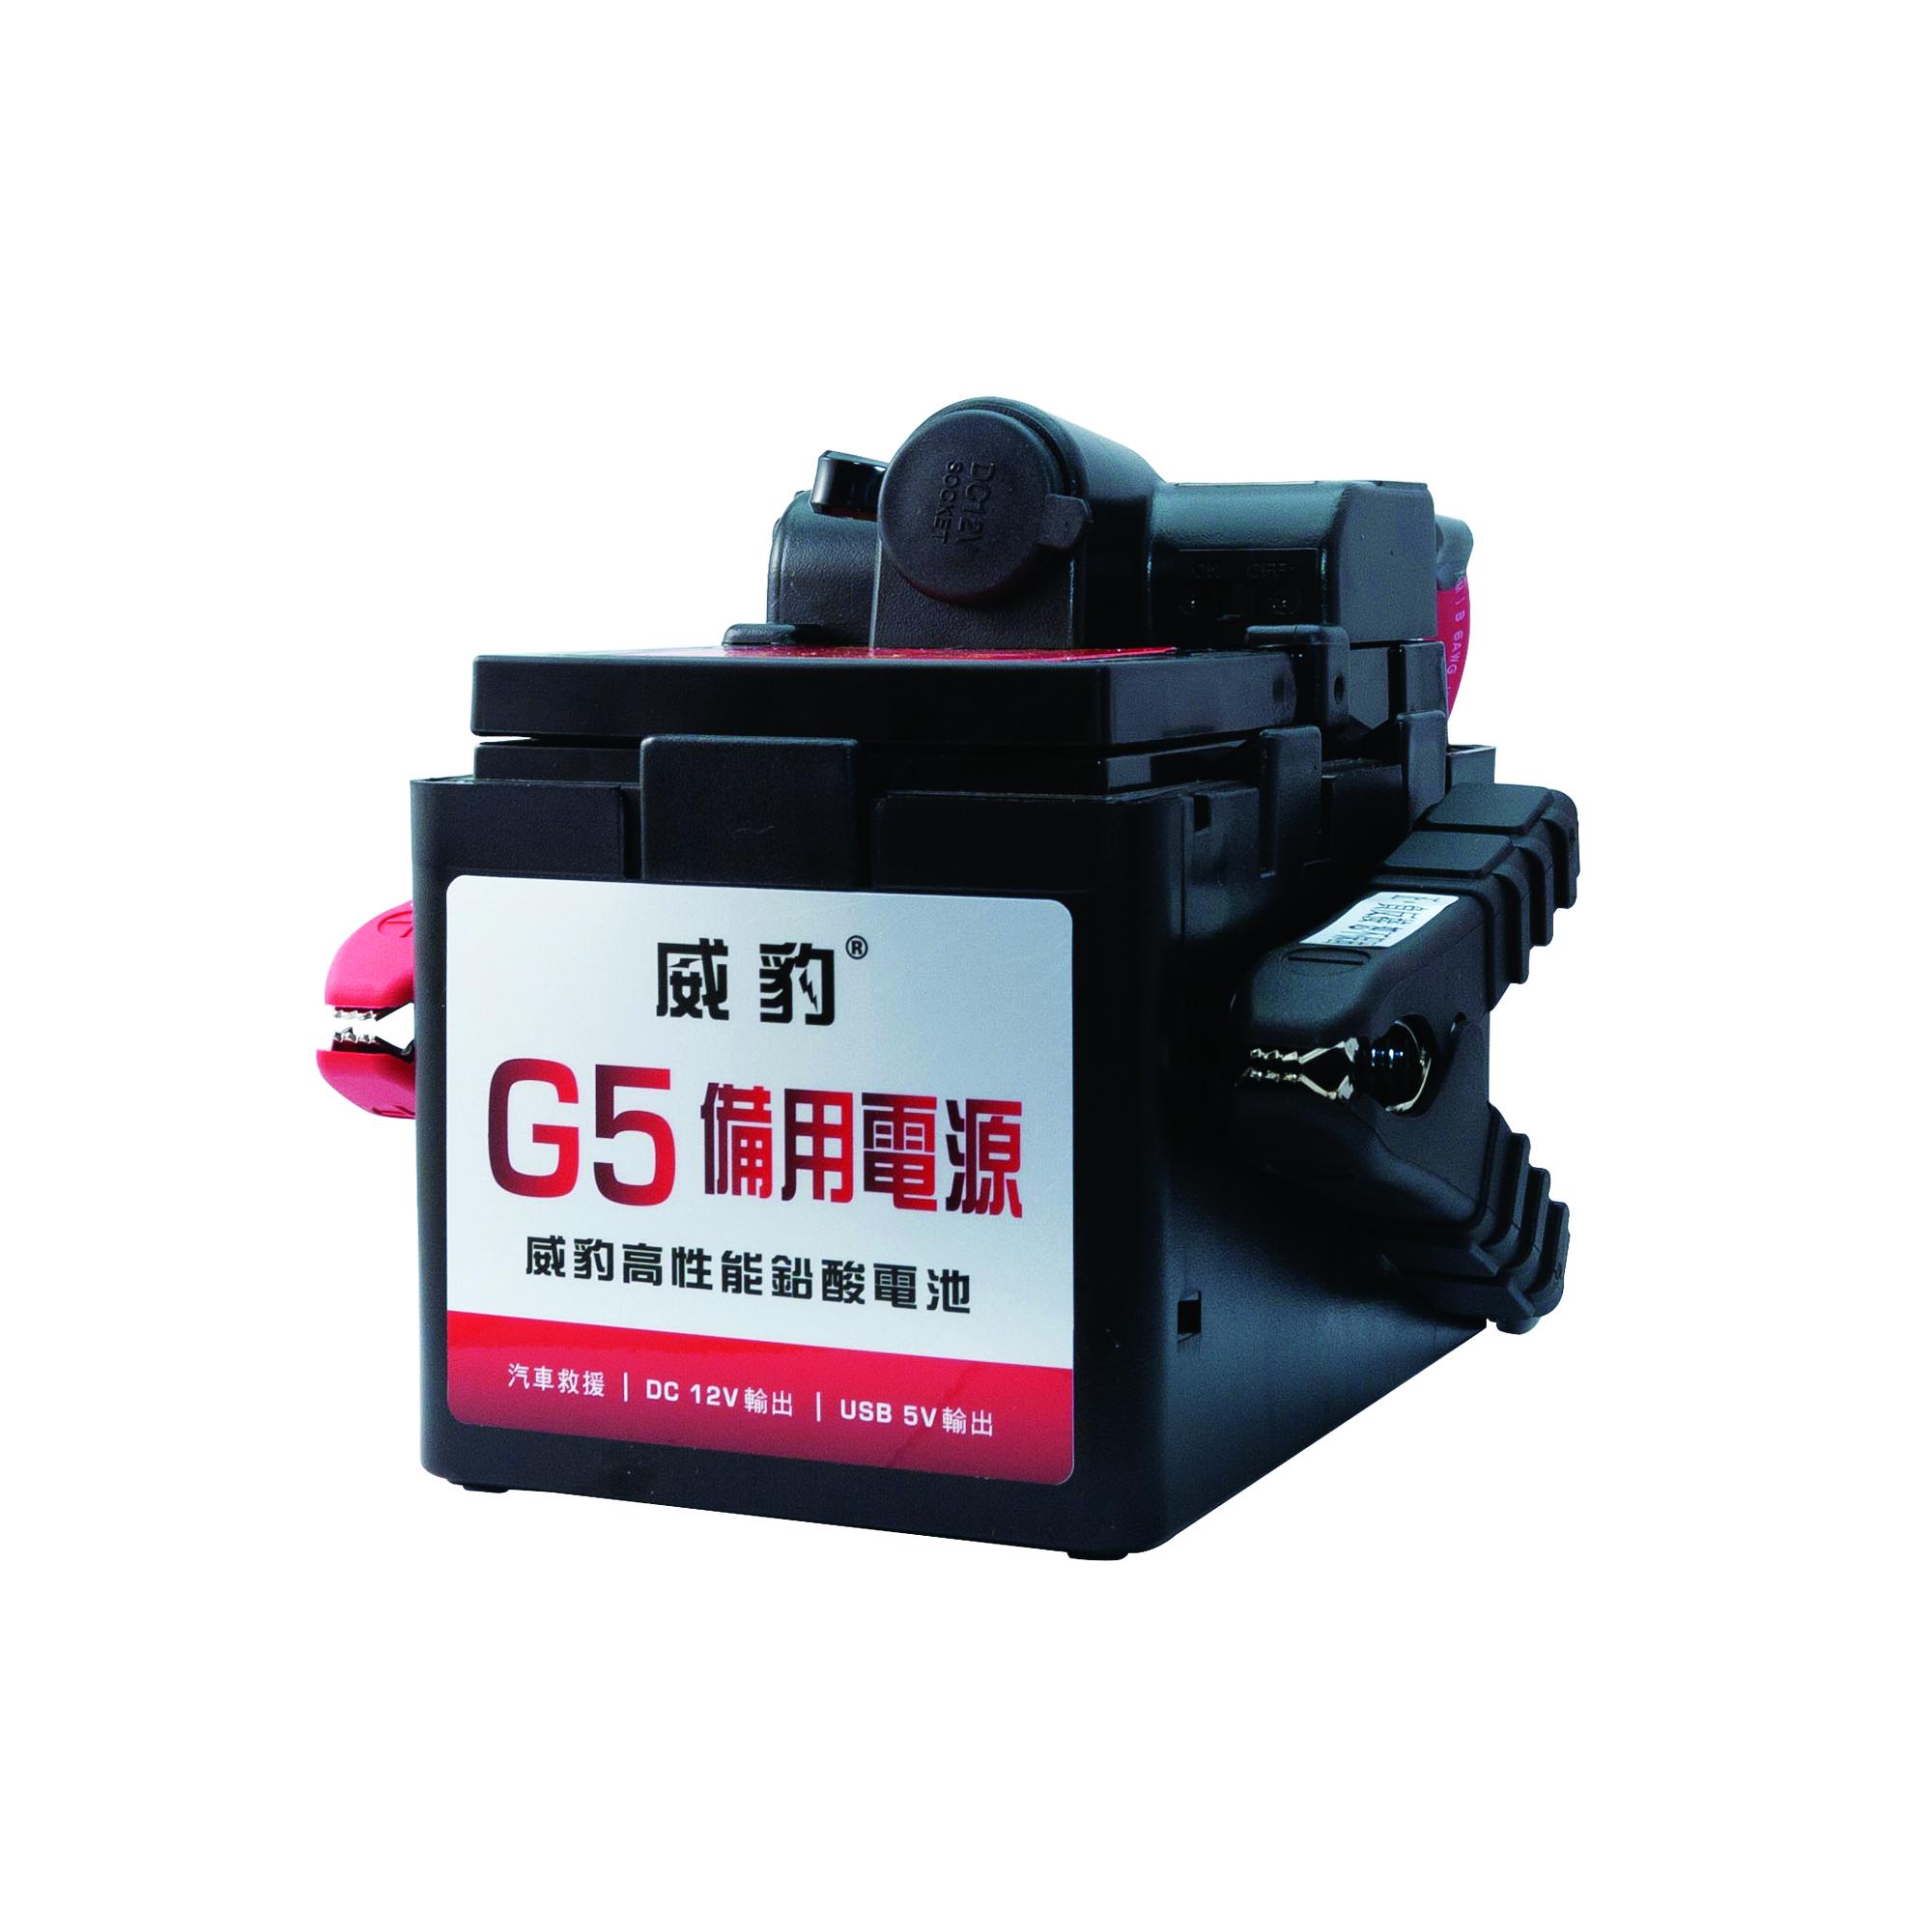 G5N02 Super Mini Booster/Jump Starter/Emergency Car Starter